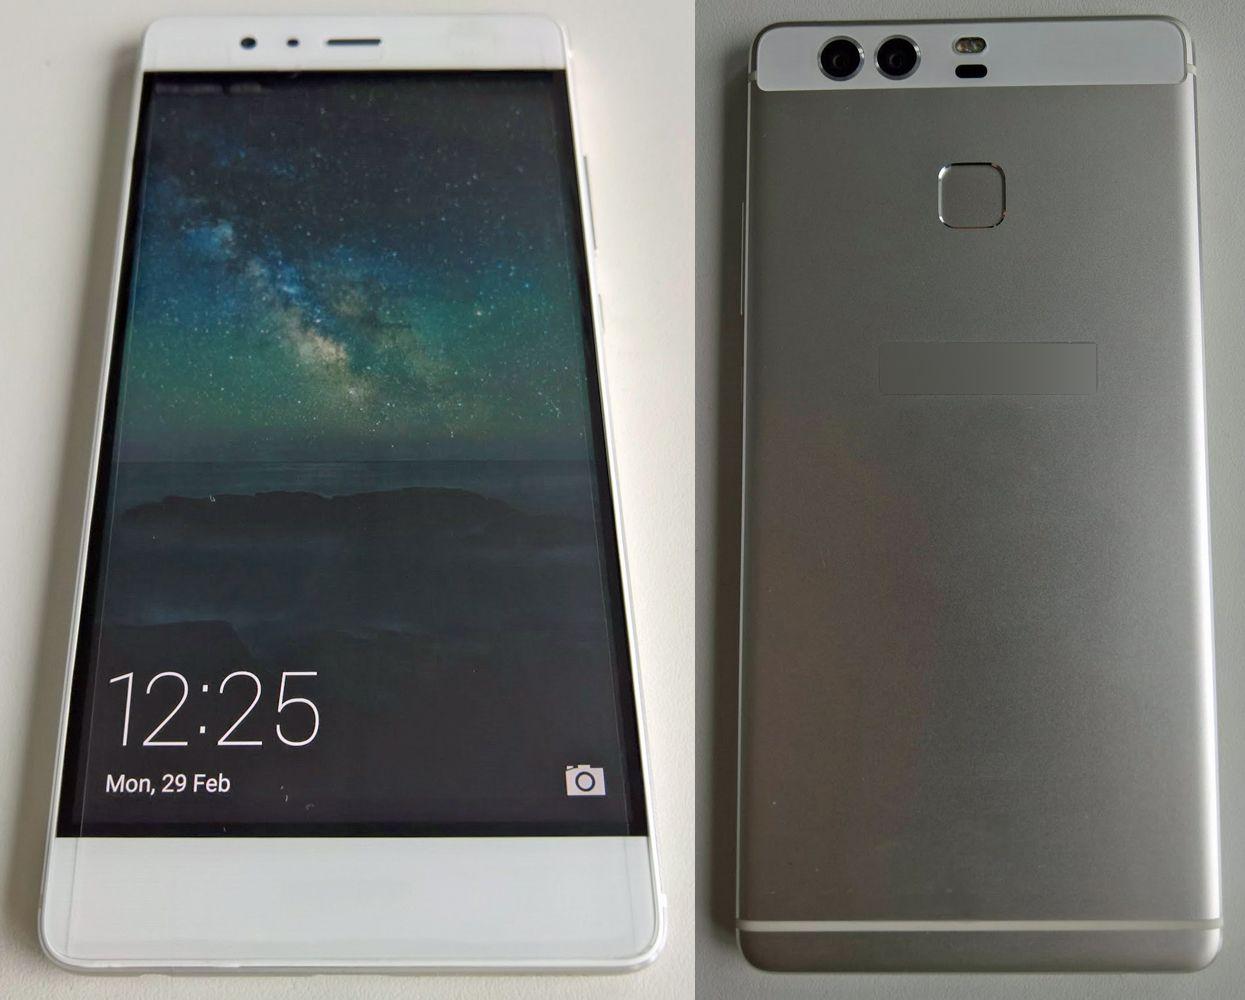 Huawei P92 » Spesifikasi dan Harga Huawei G8, Ponsel Kelas Menengah